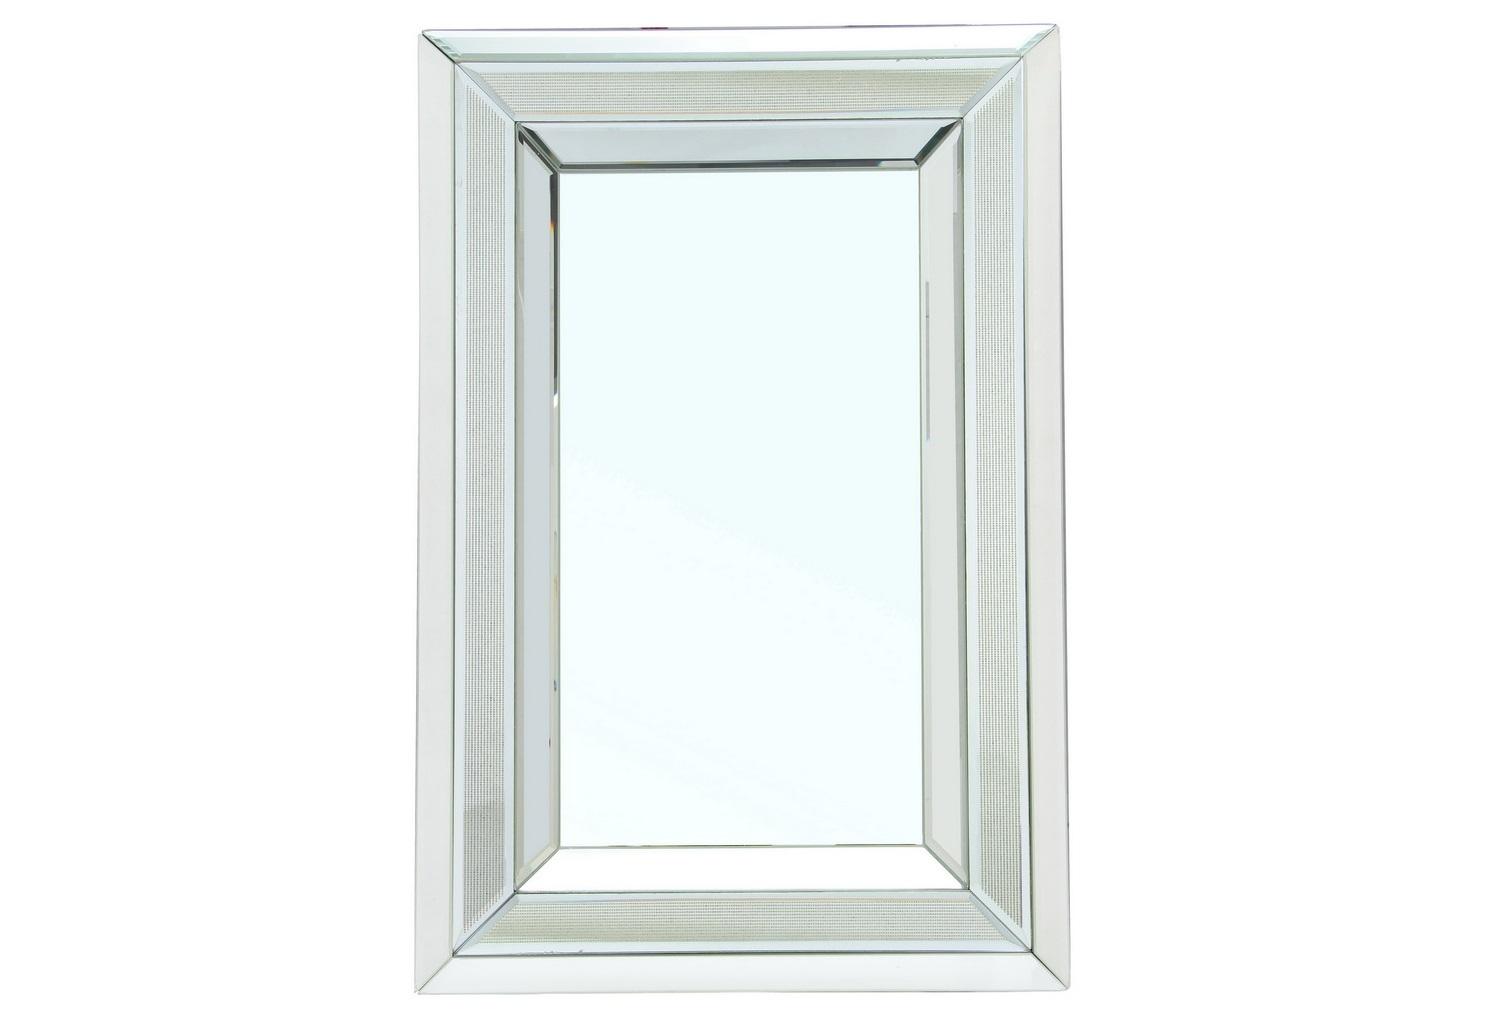 Зеркало настенноеНастенные зеркала<br><br><br>Material: МДФ<br>Ширина см: 40<br>Высота см: 60<br>Глубина см: 4